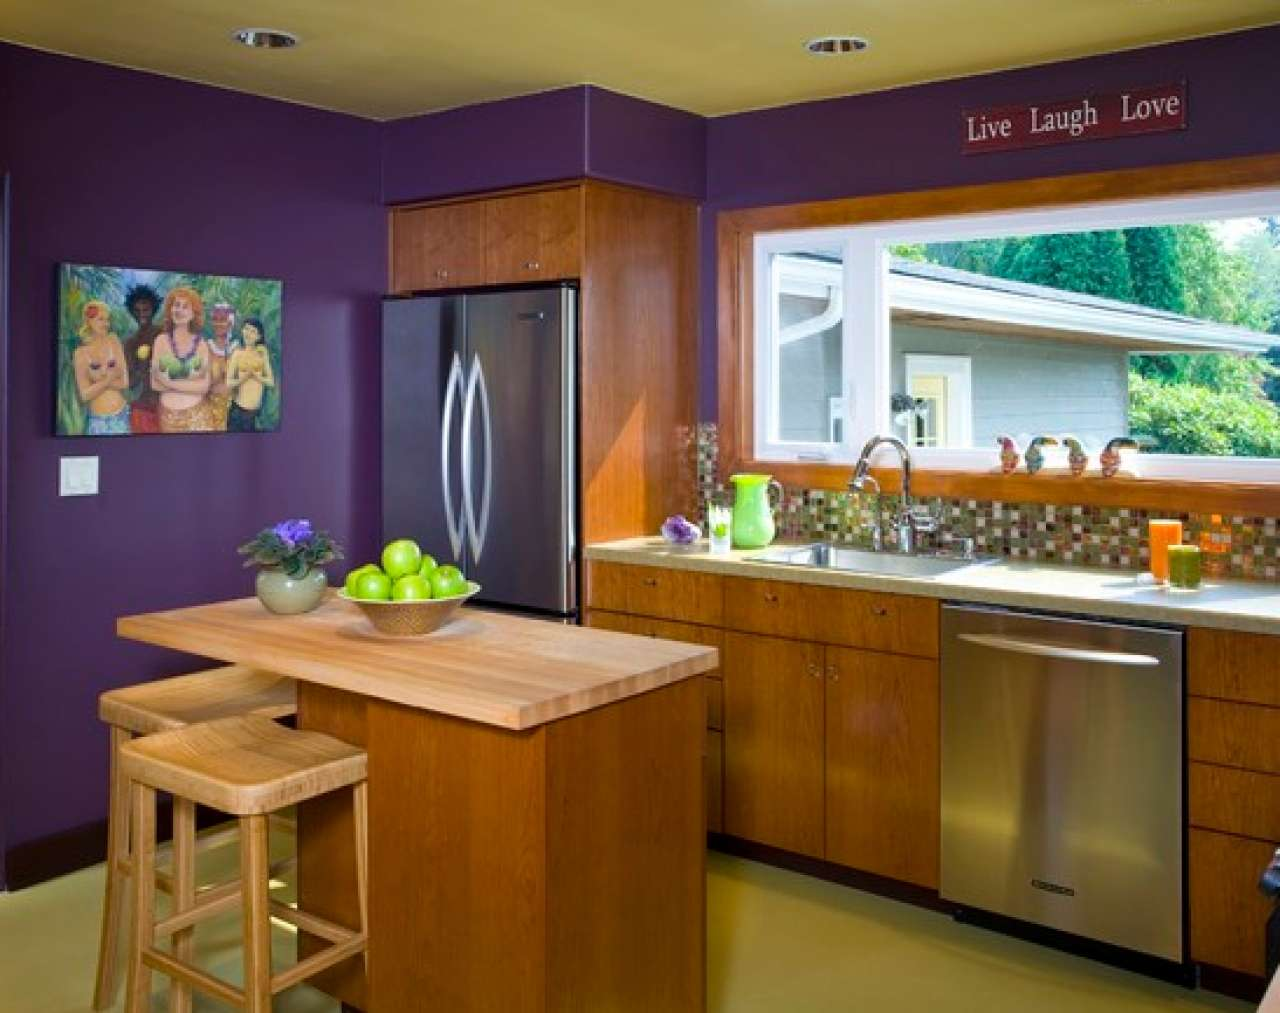 100+ ideas Purple And Lime Green Kitchen on www.weboolu.com